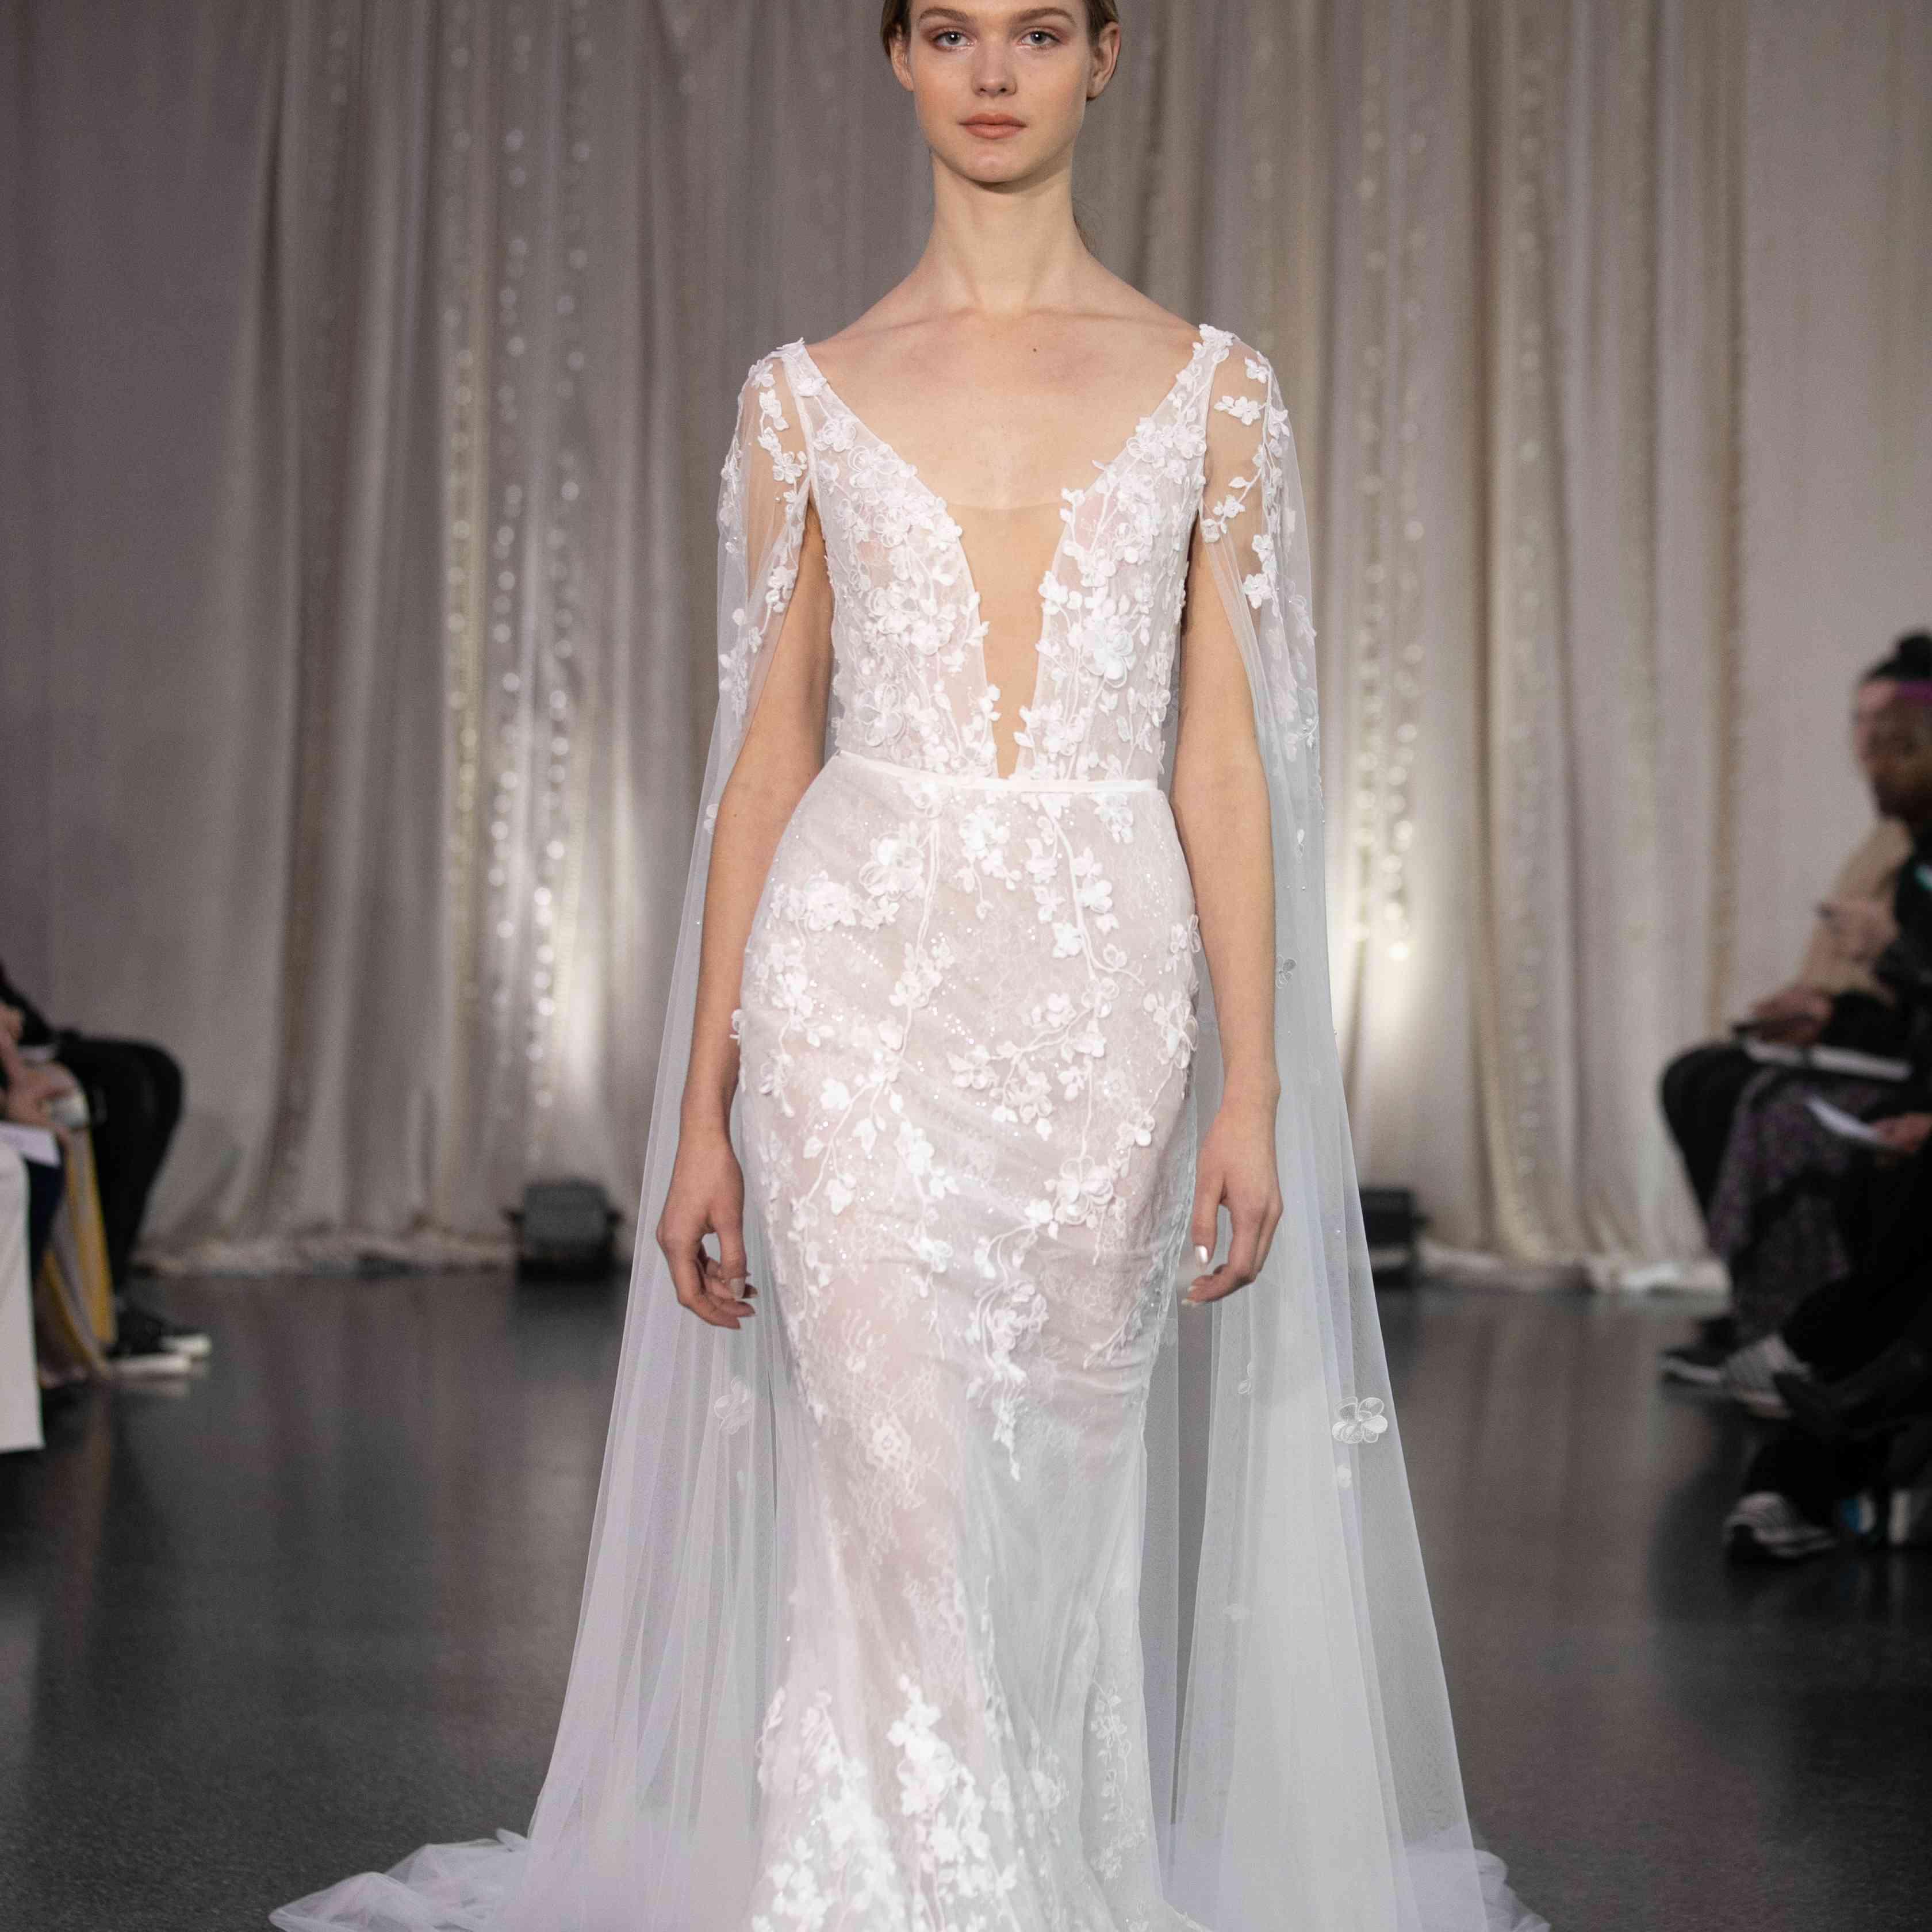 Model in plunging neckline mermaid wedding dress